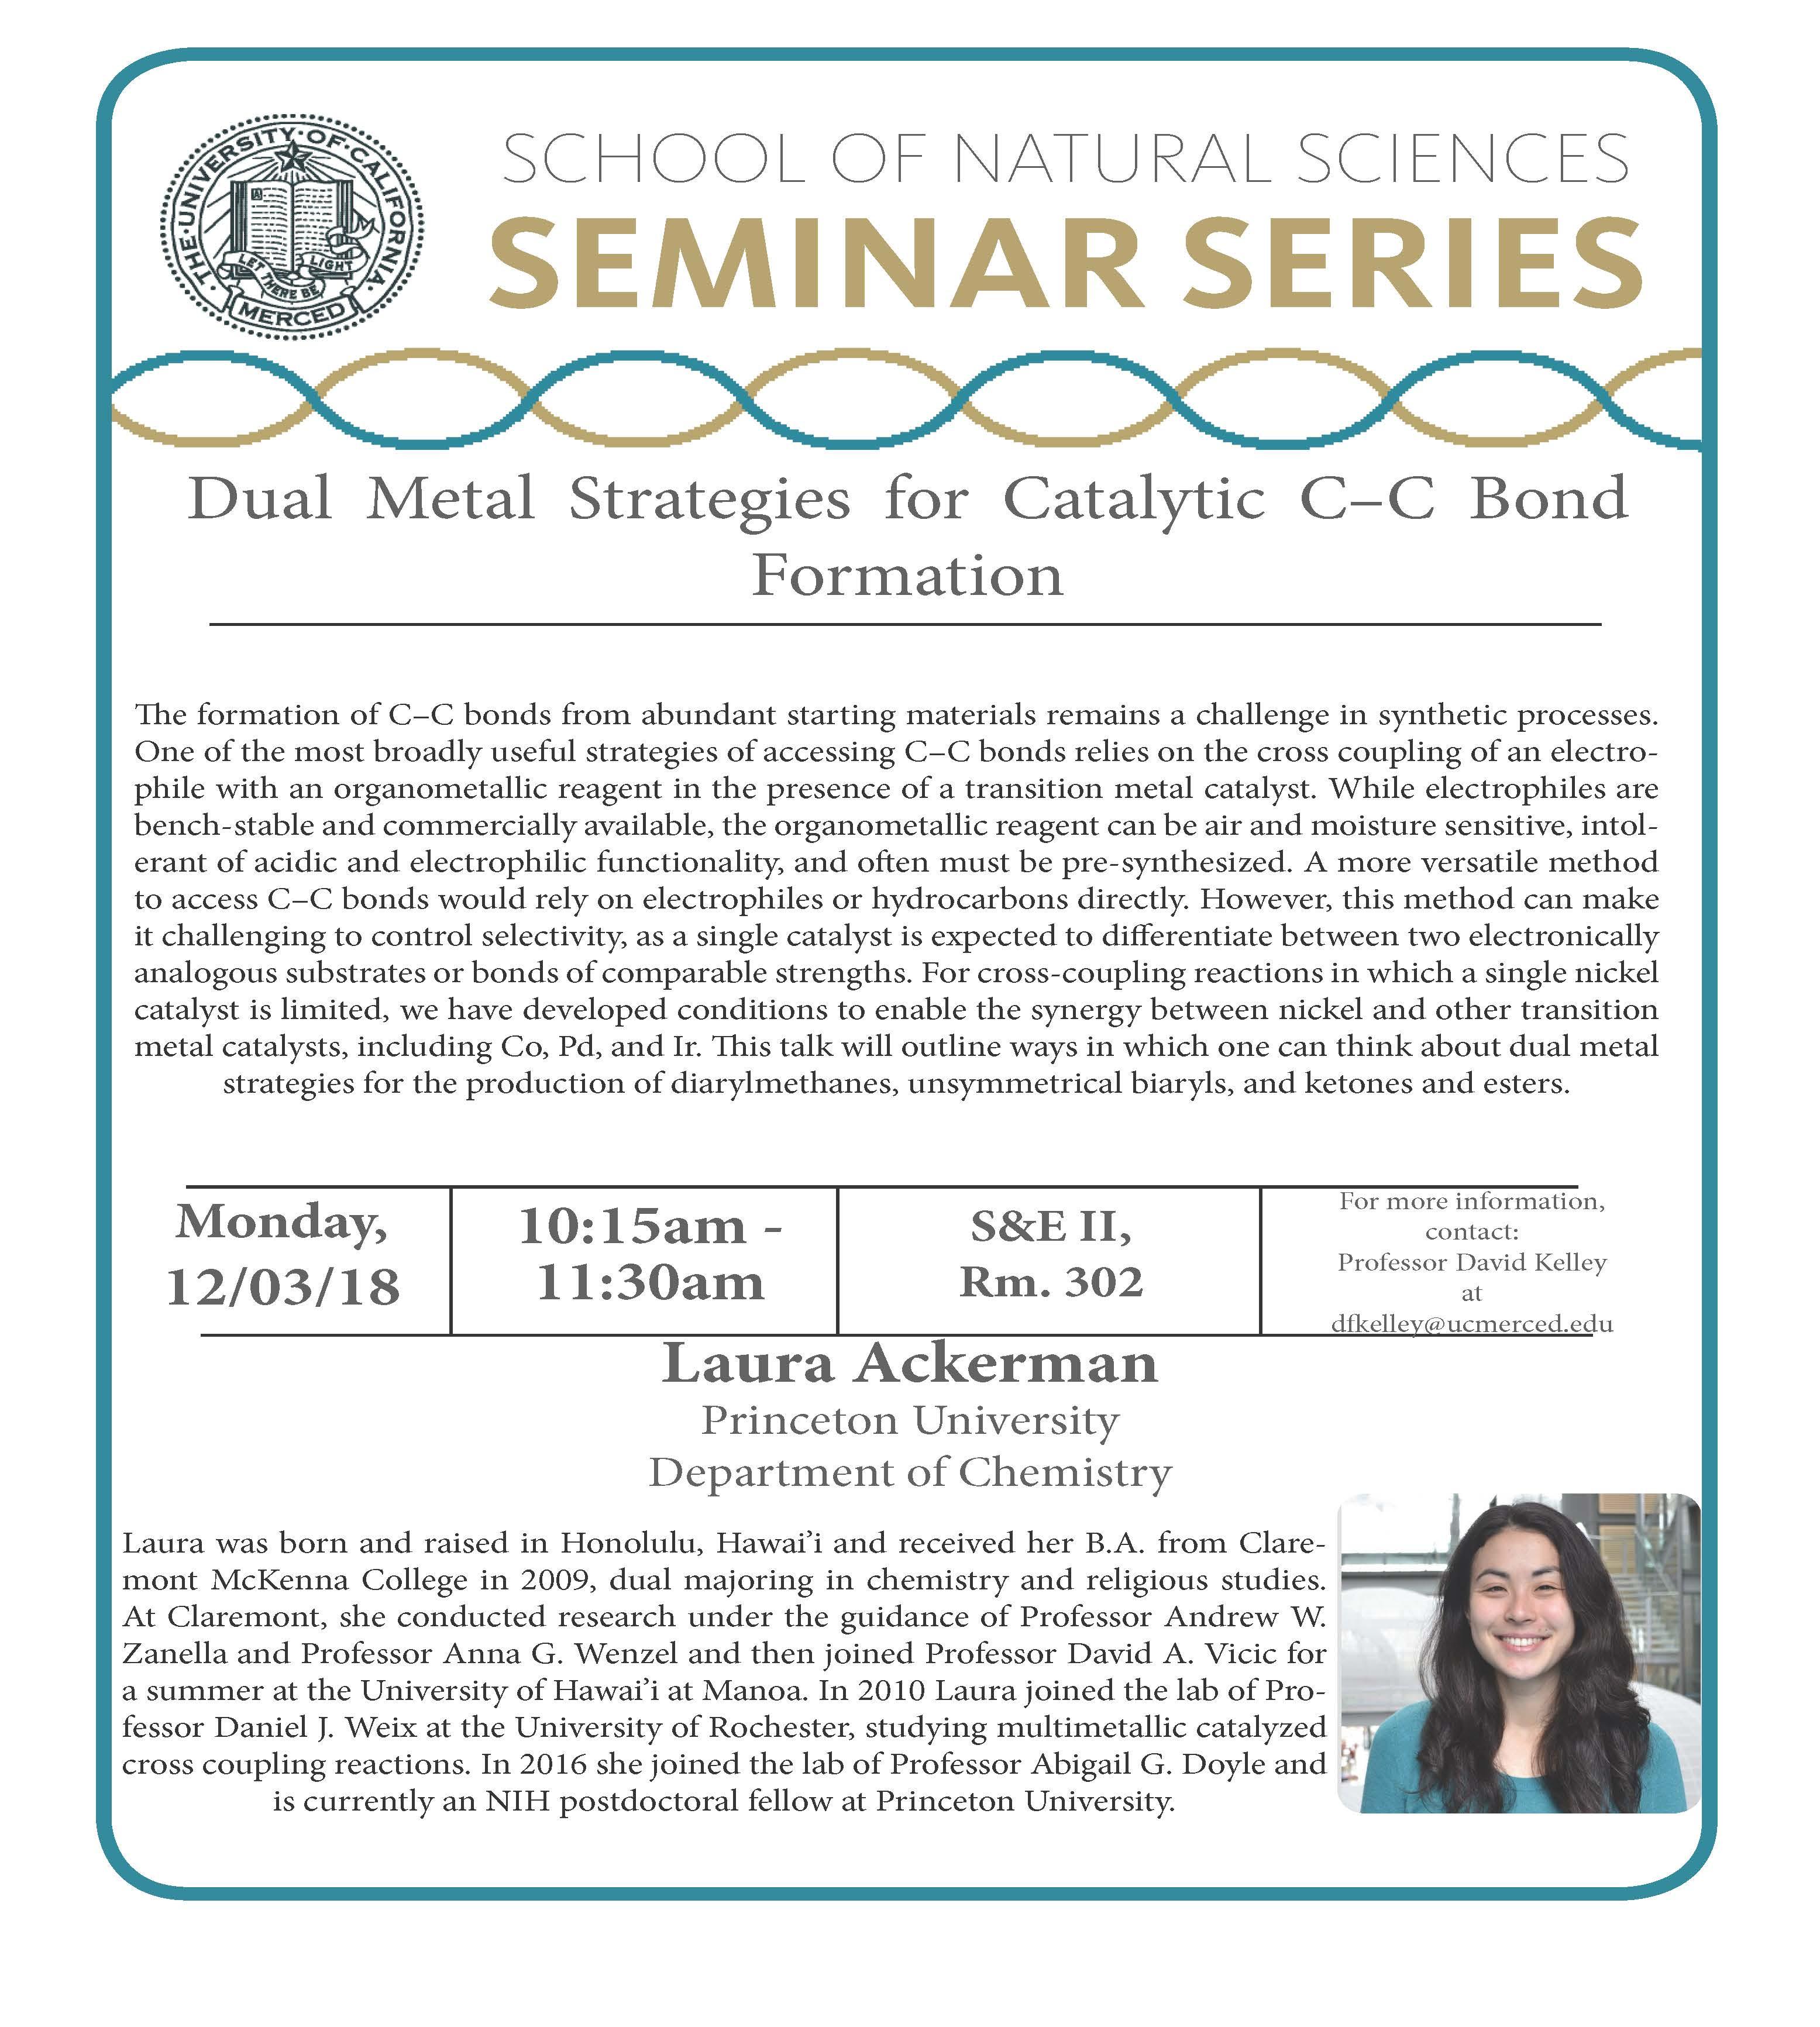 CCB Seminar- Laura Ackerman